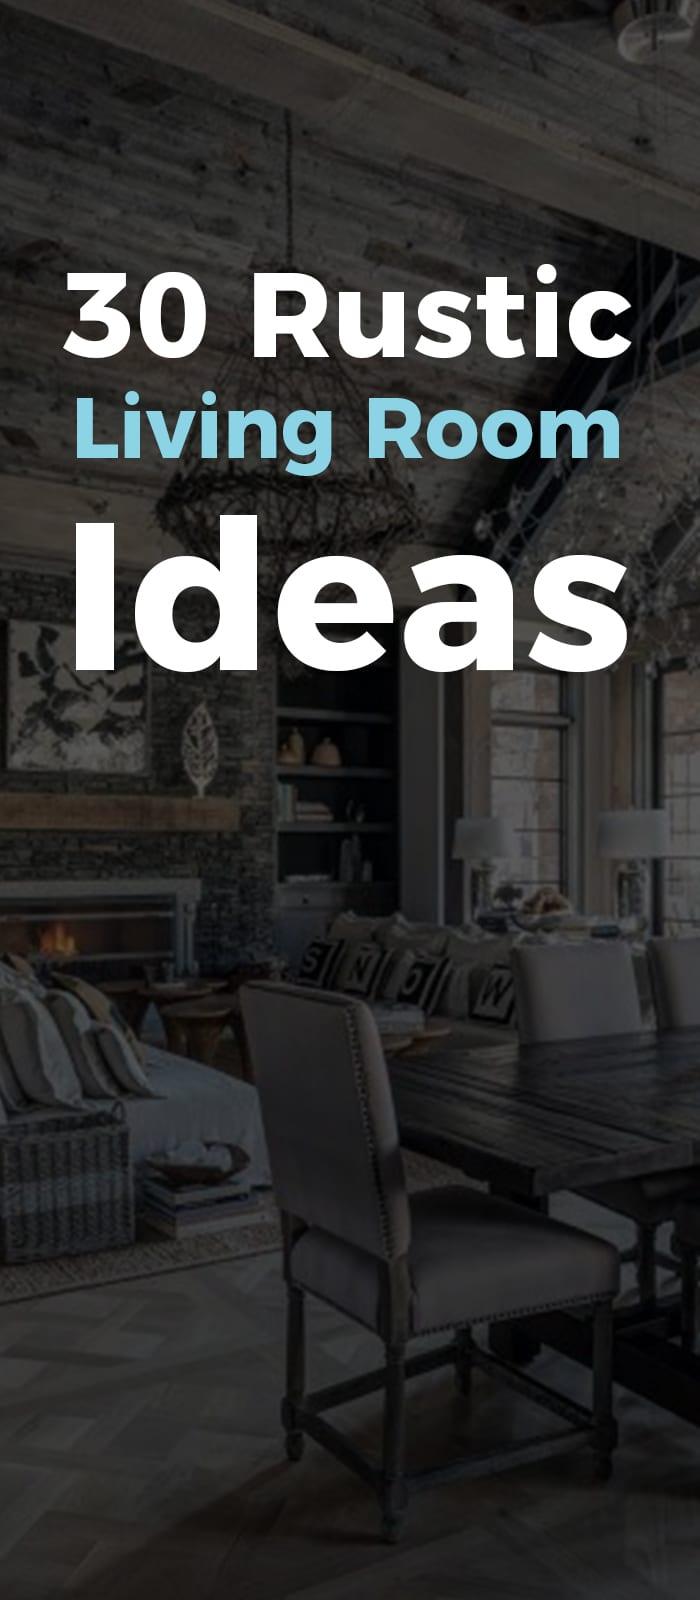 Creative rustic living room decor ideas.